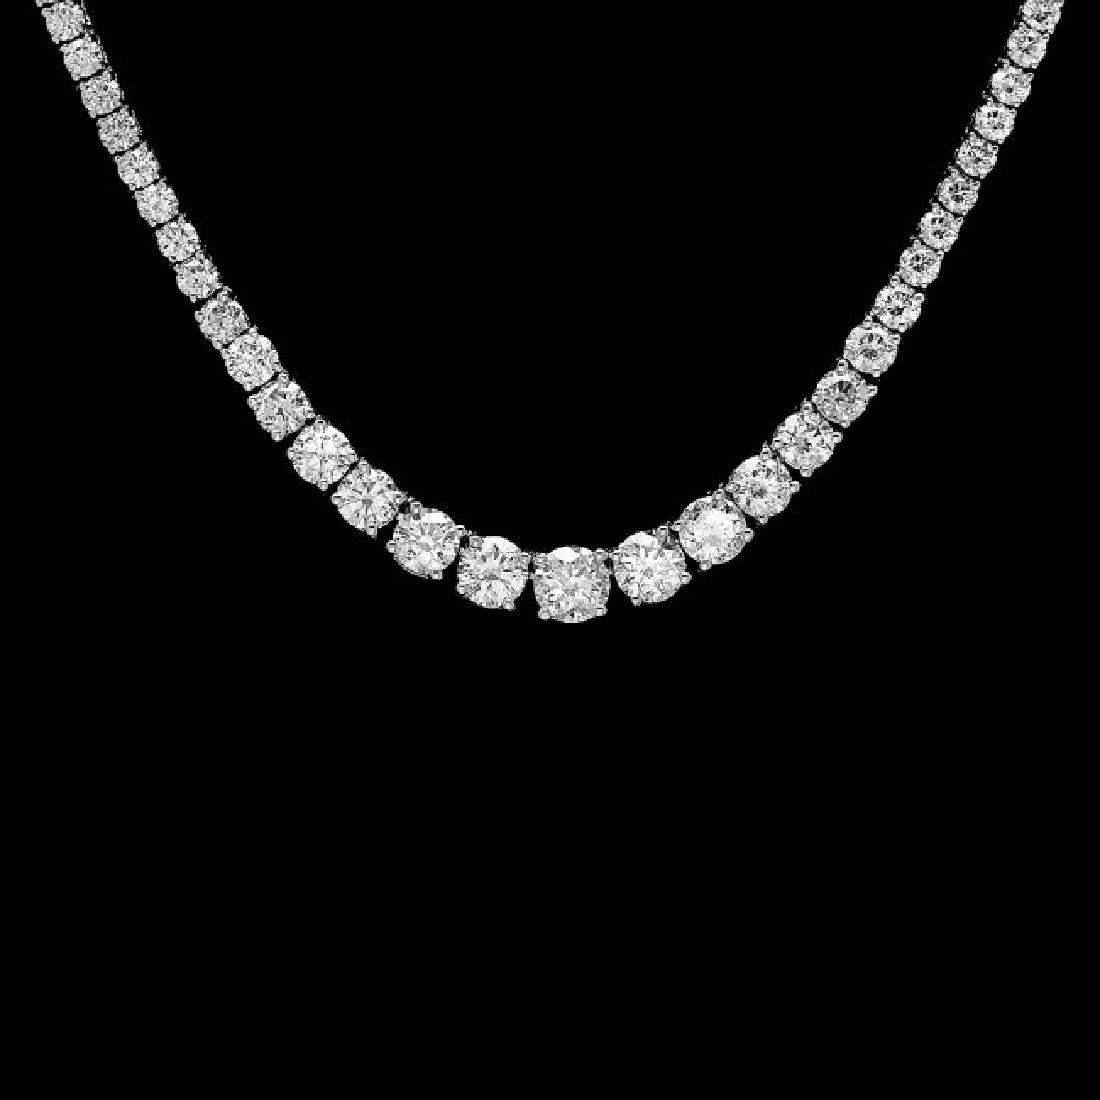 18k White Gold 13.00ct Diamond Necklace